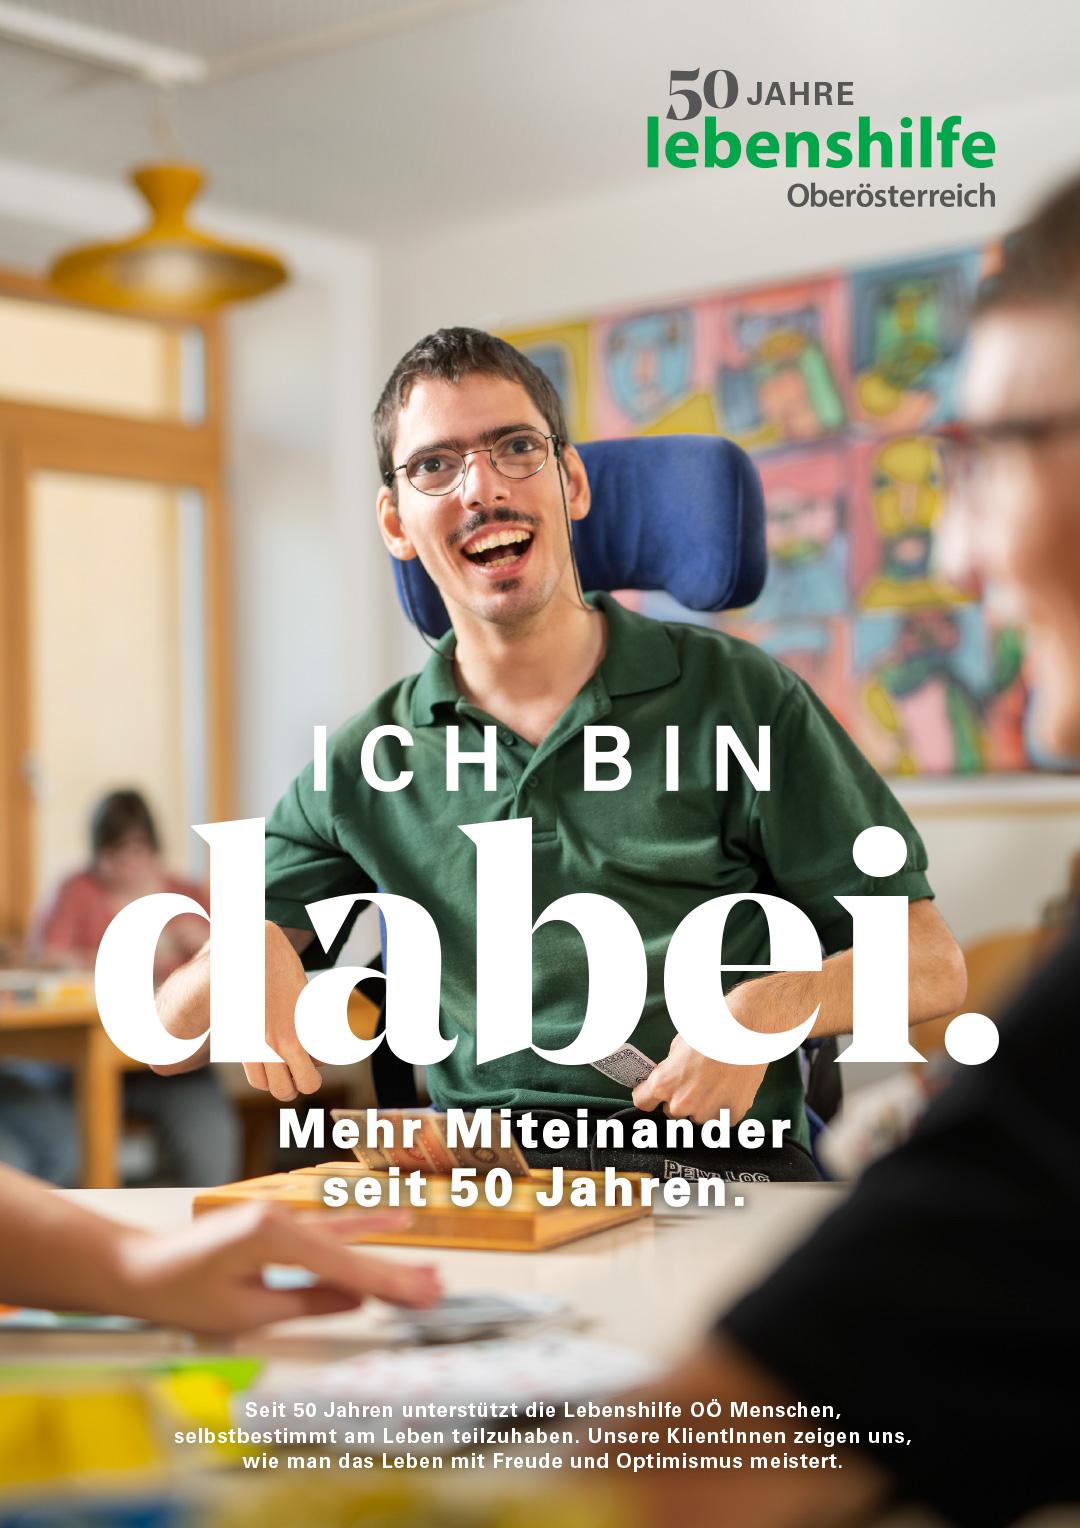 djw-lebenshilfe-hoch-sujet-kartenspielen2